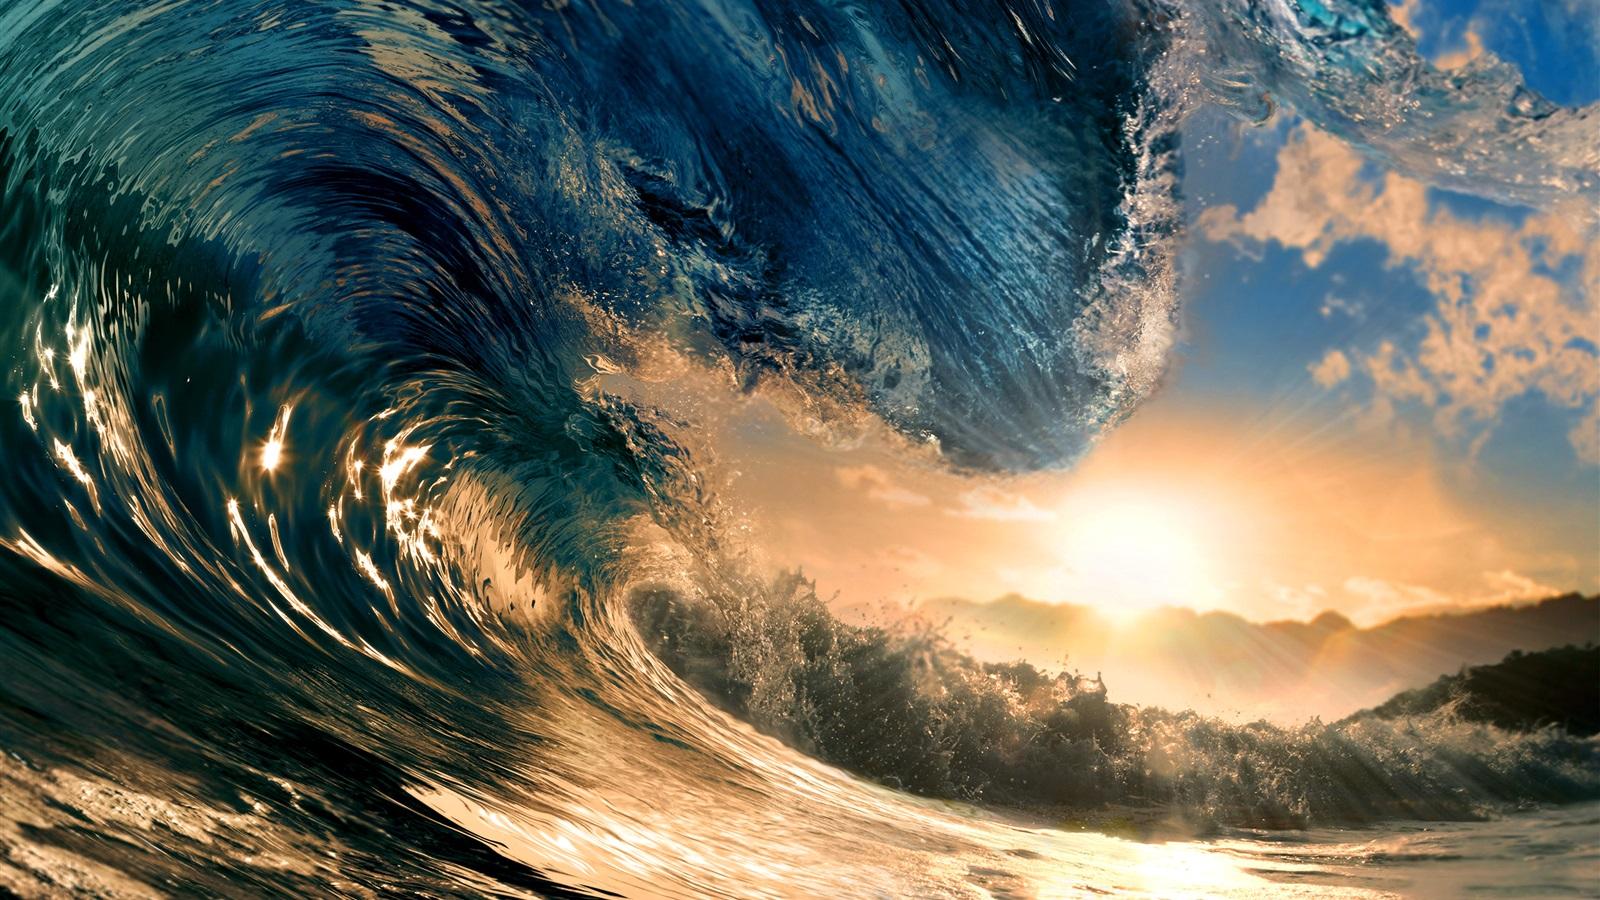 Море солнце лучи Sea the sun rays  № 1623274  скачать